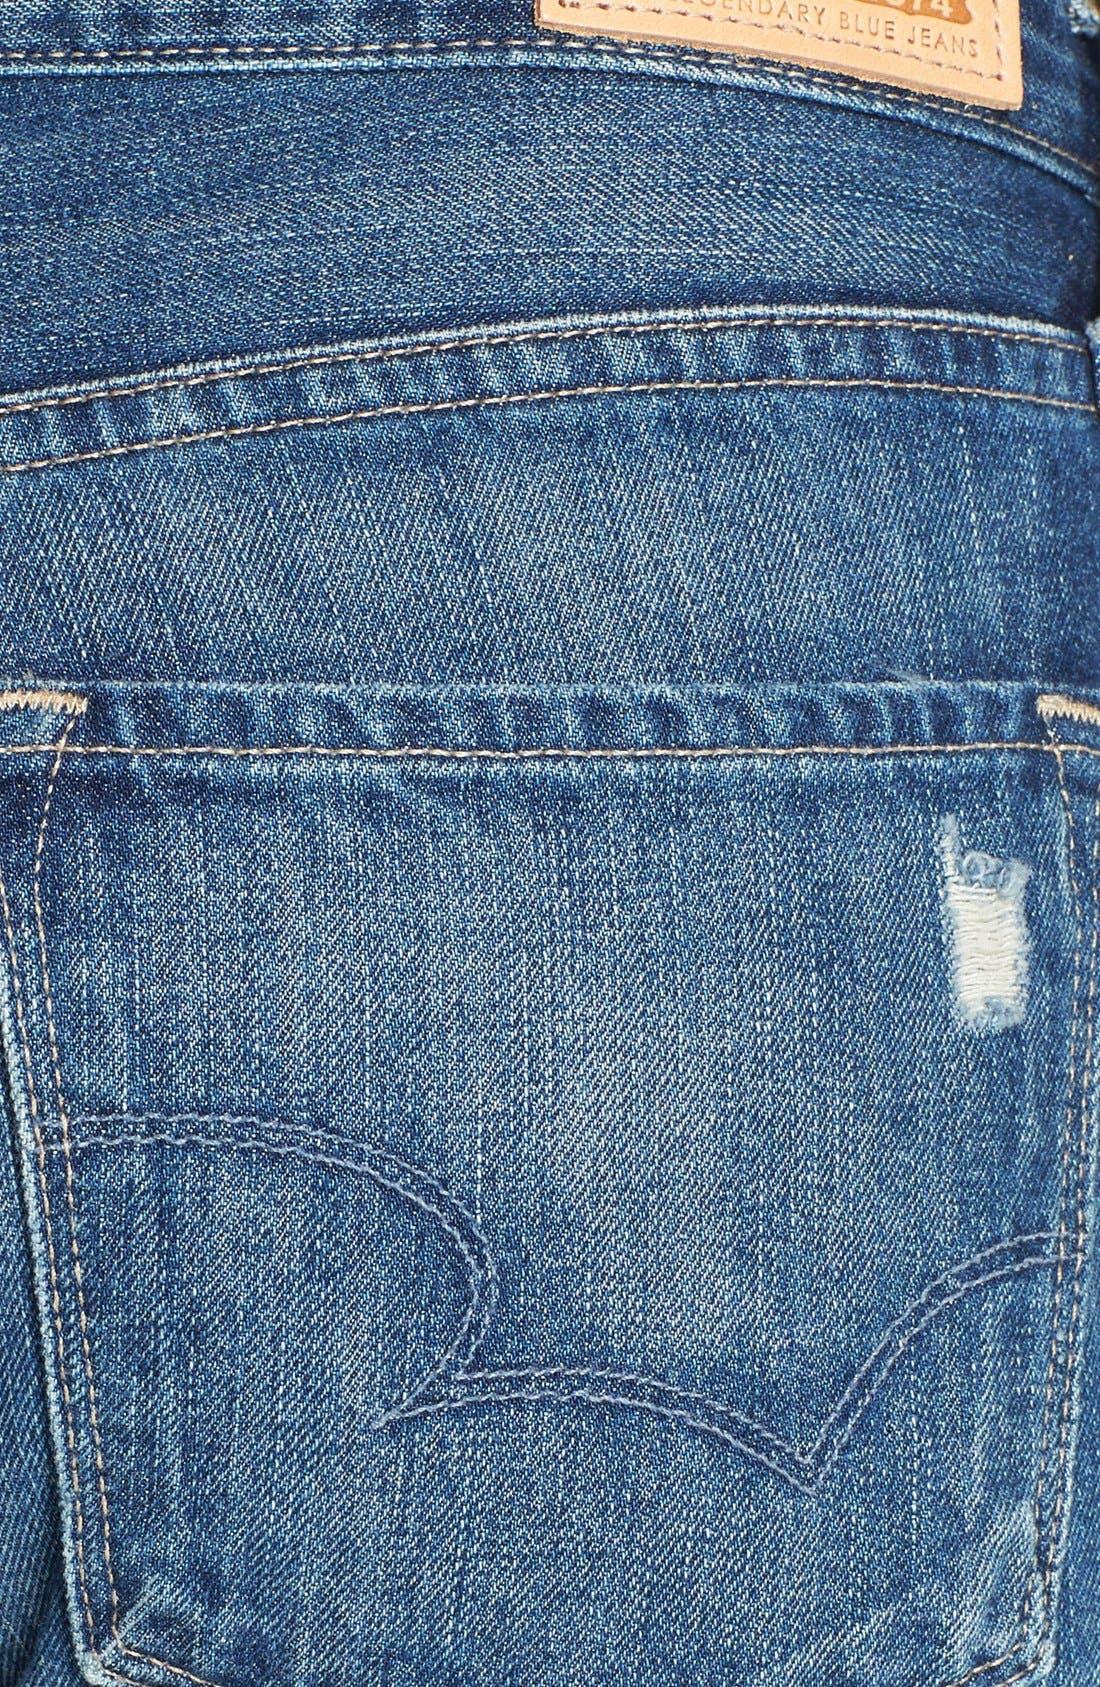 'Joey' Boyfriend Jeans,                             Alternate thumbnail 3, color,                             406